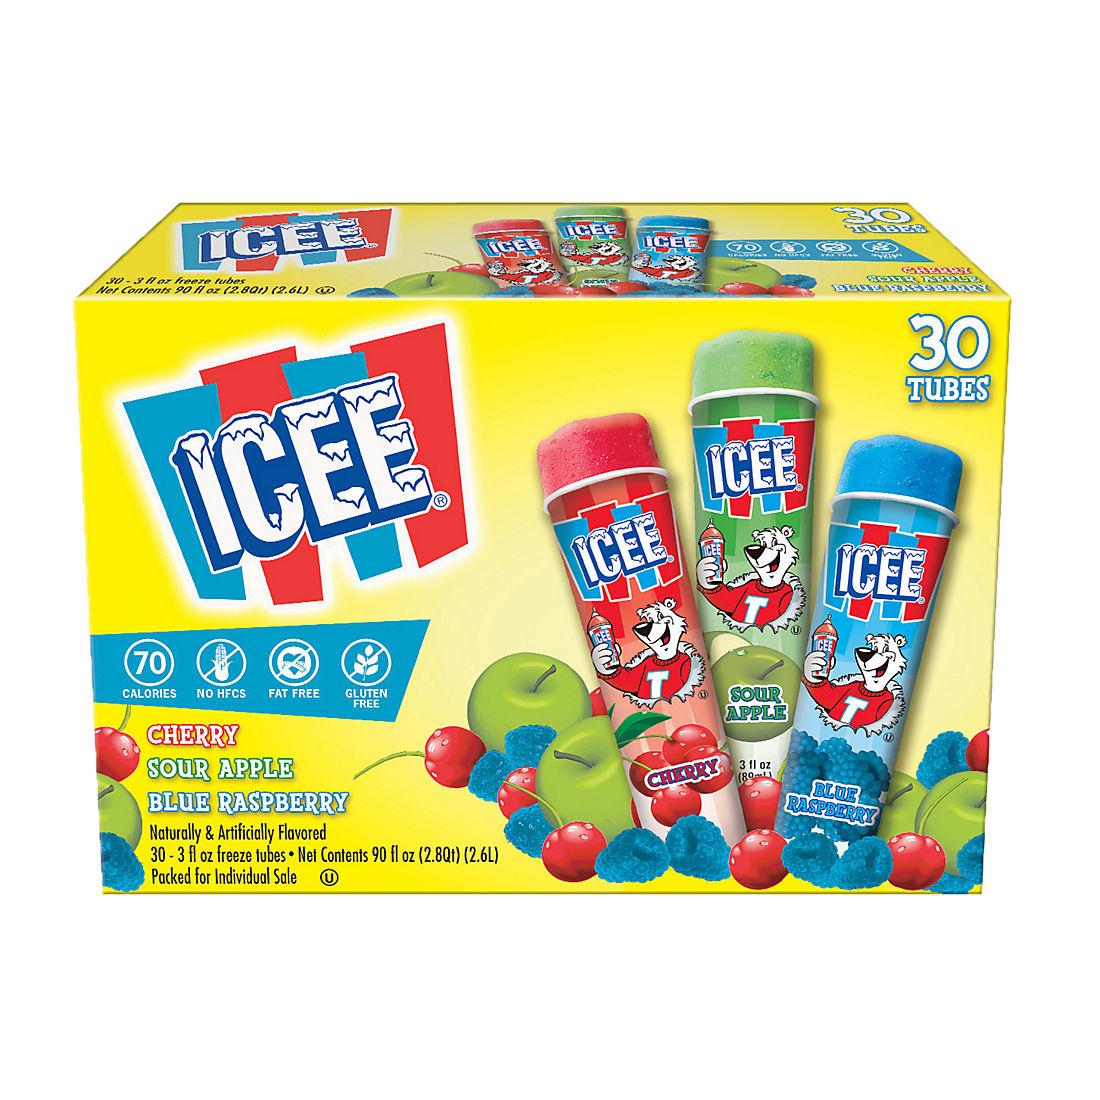 ICEE Variety Freeze Tubes, 30 ct./3 fl